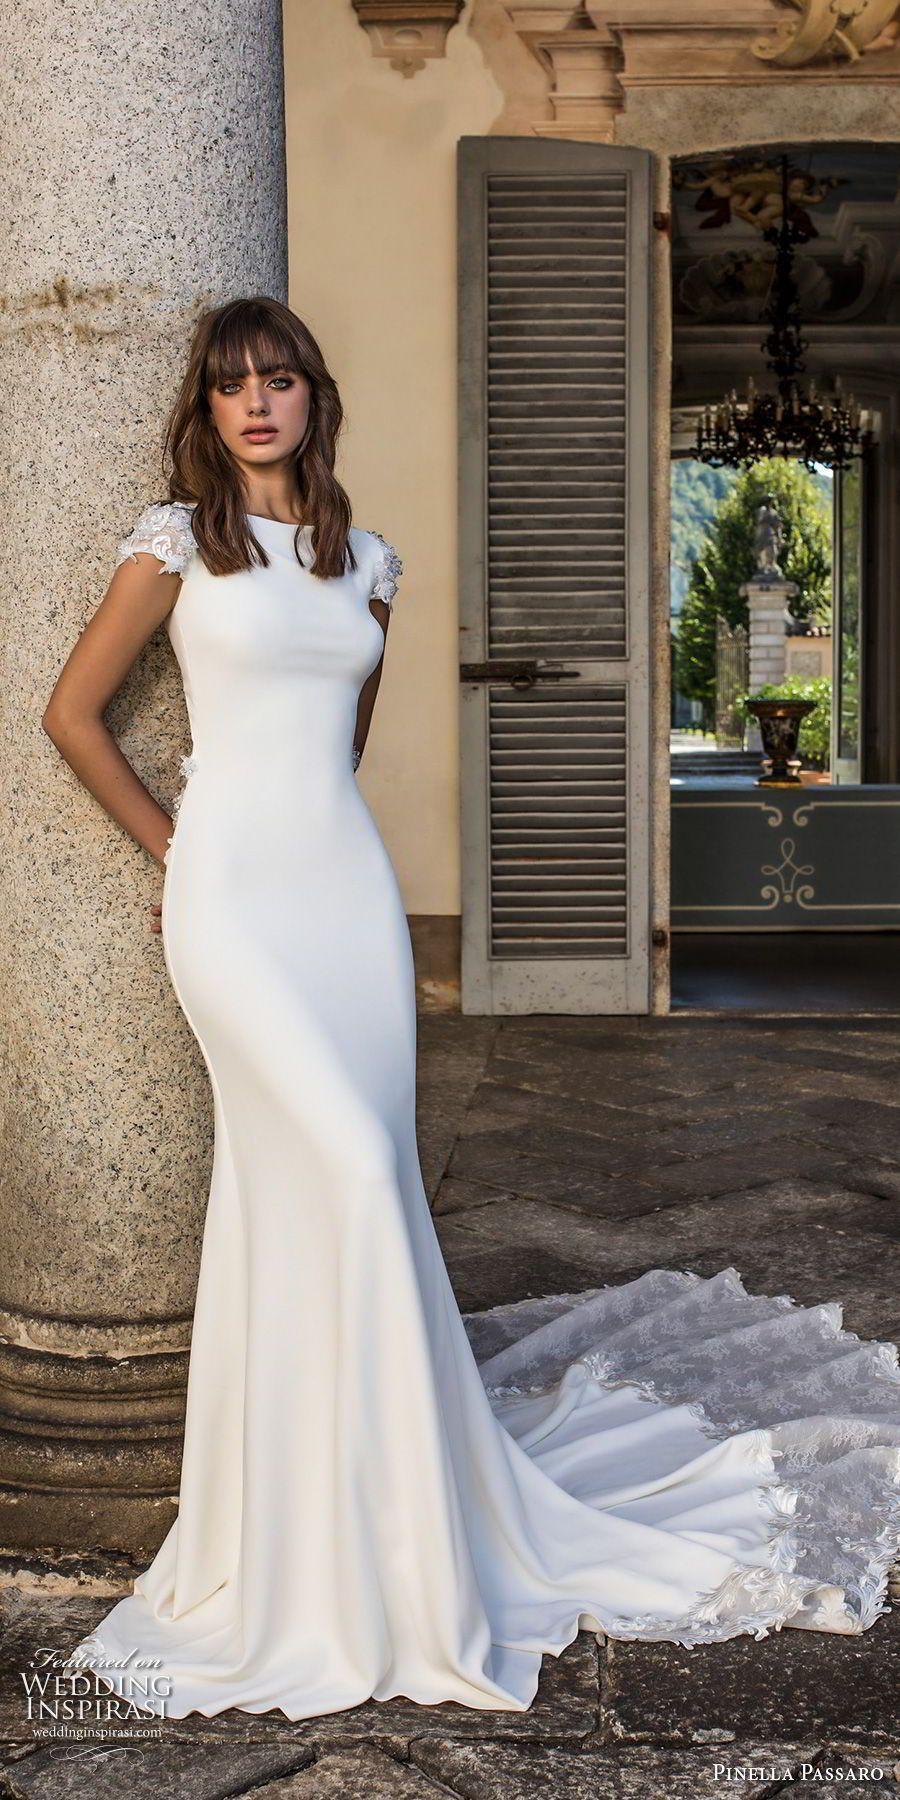 Pinella passaro bridal cap sleeves bateau neck simple clean